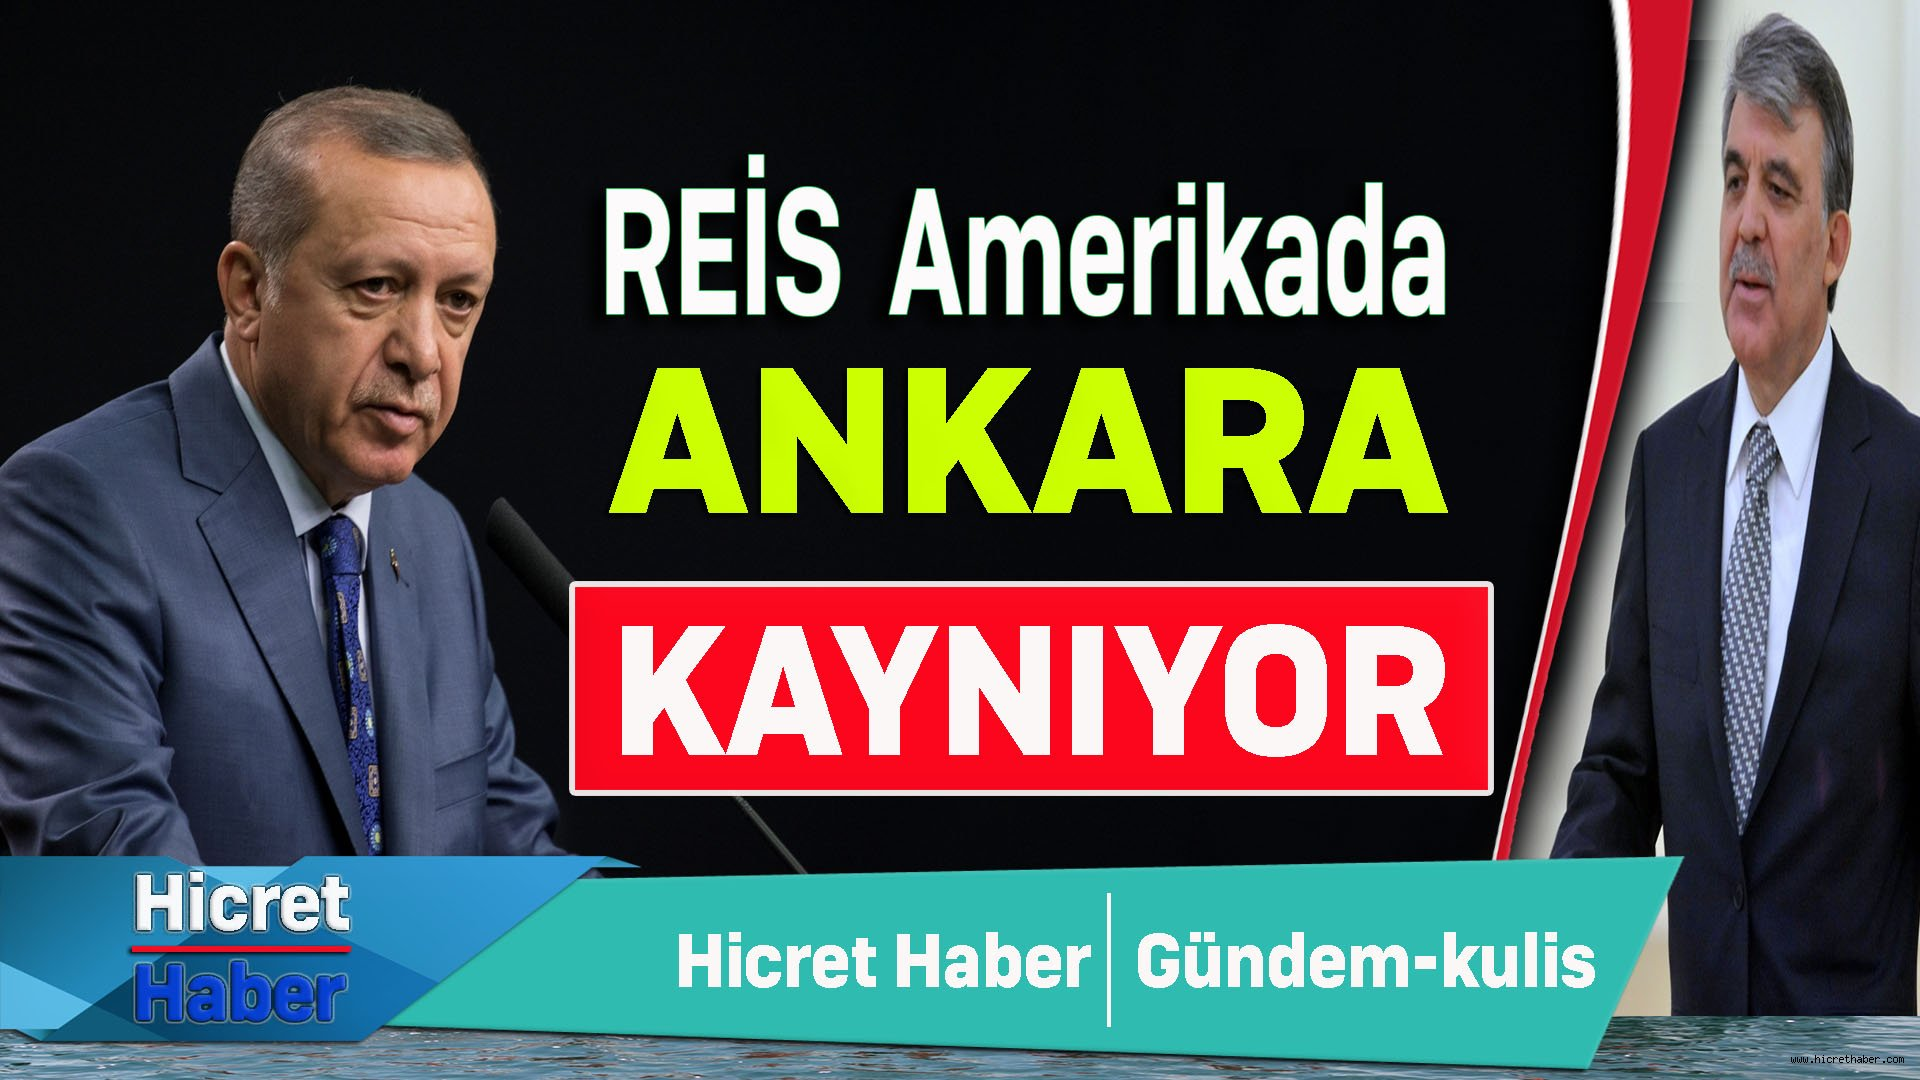 Reis, Amerika'da  Ankara kaynıyor